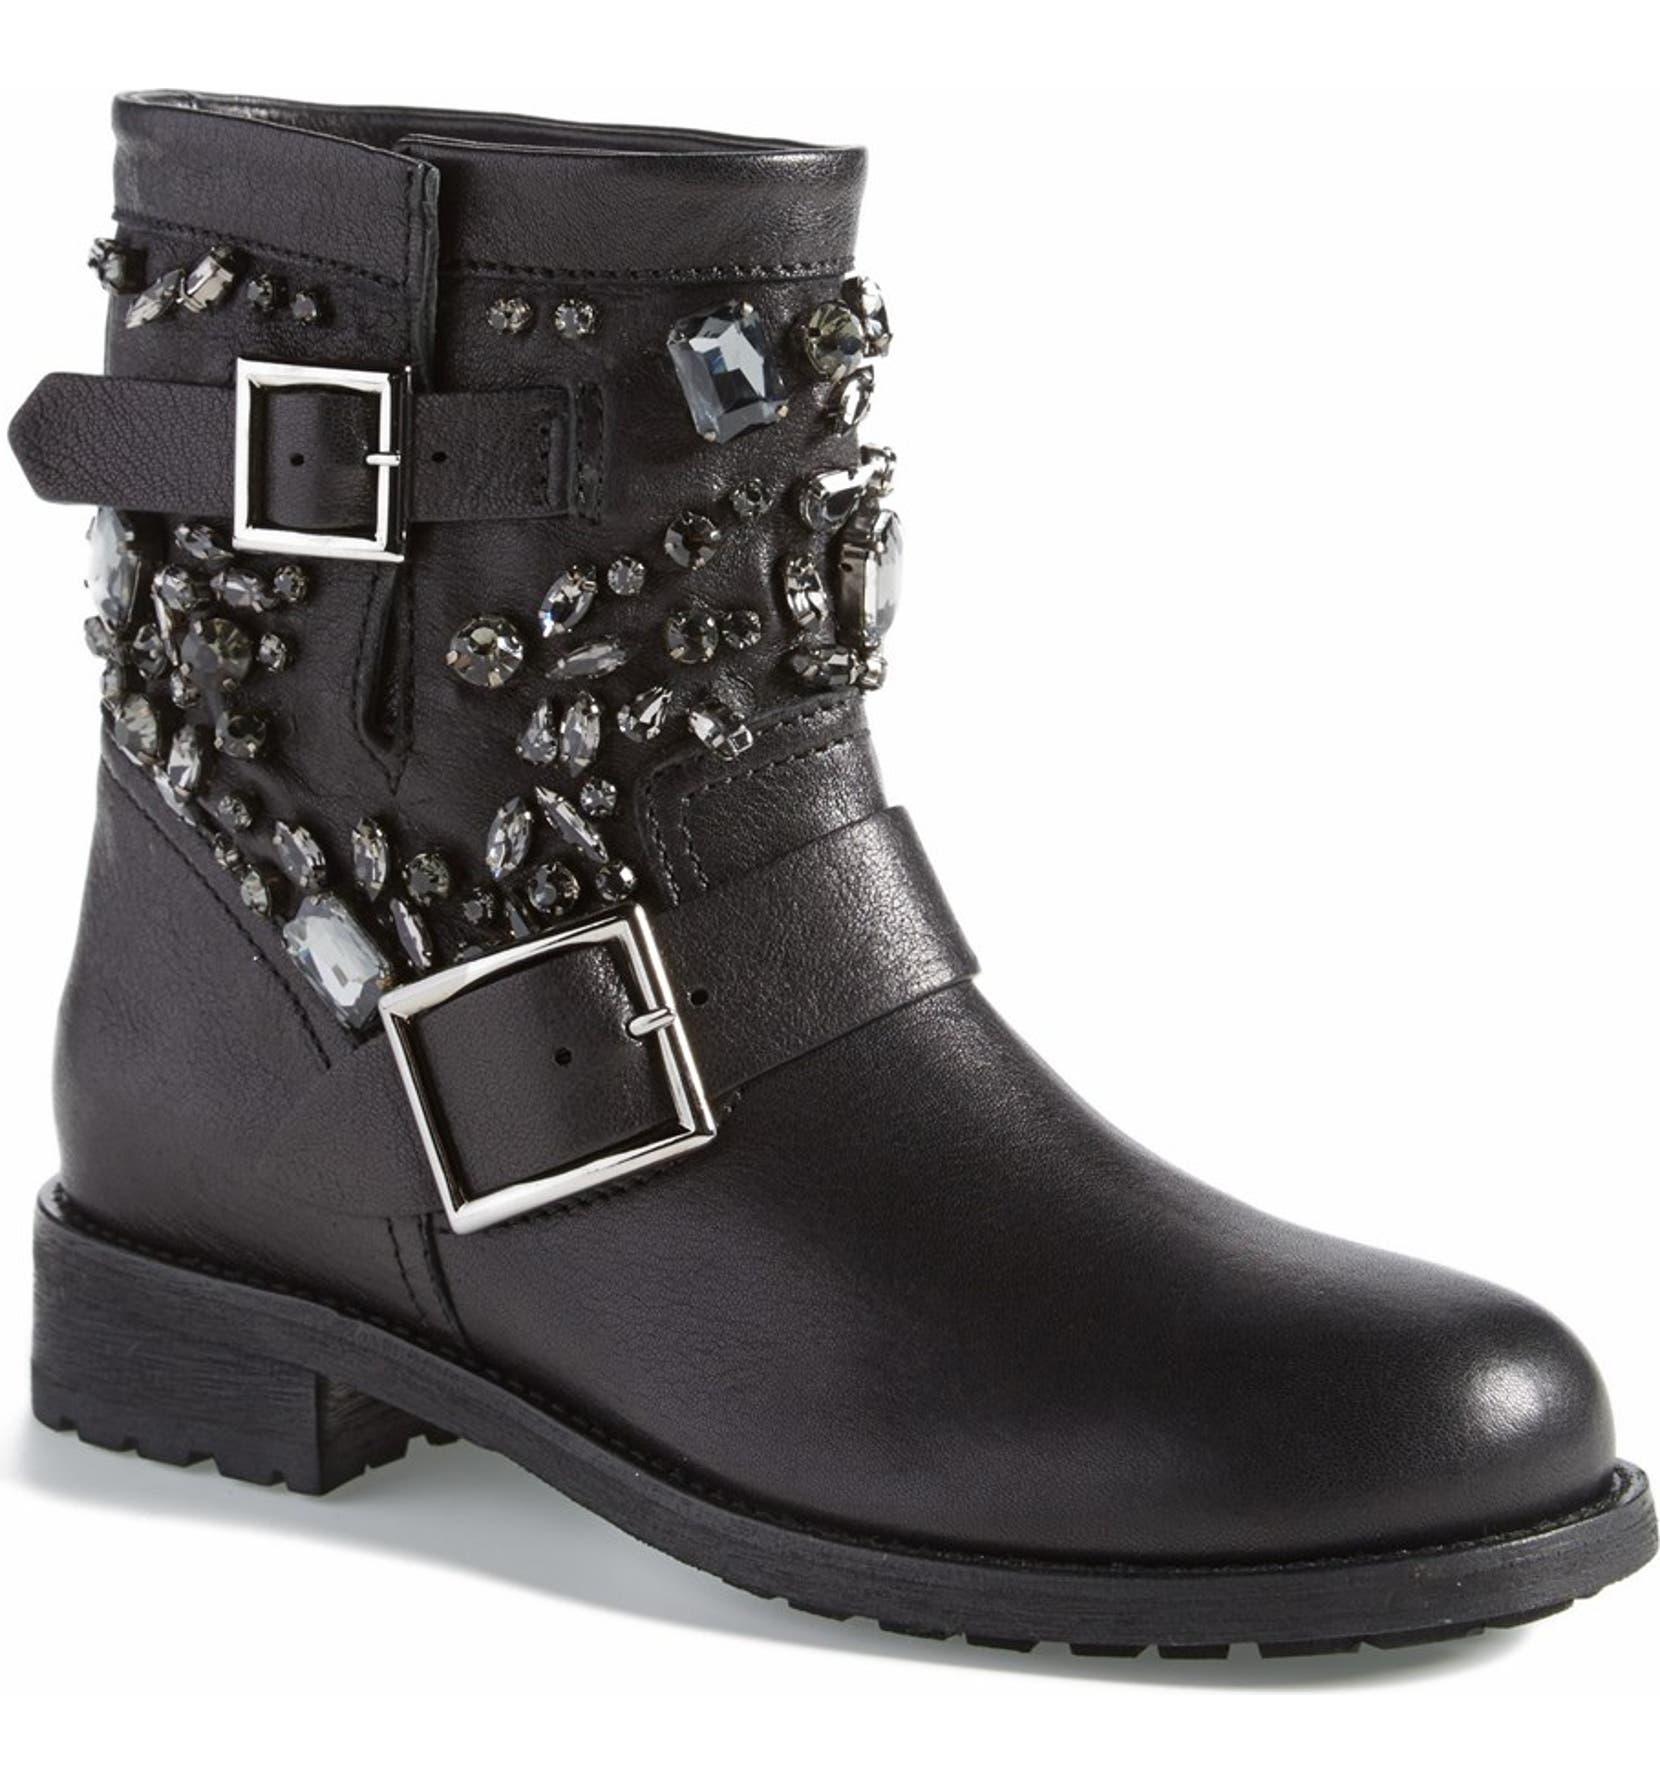 b7537bd57d23 Jimmy Choo  Youth  Short Moto Boot (Women)